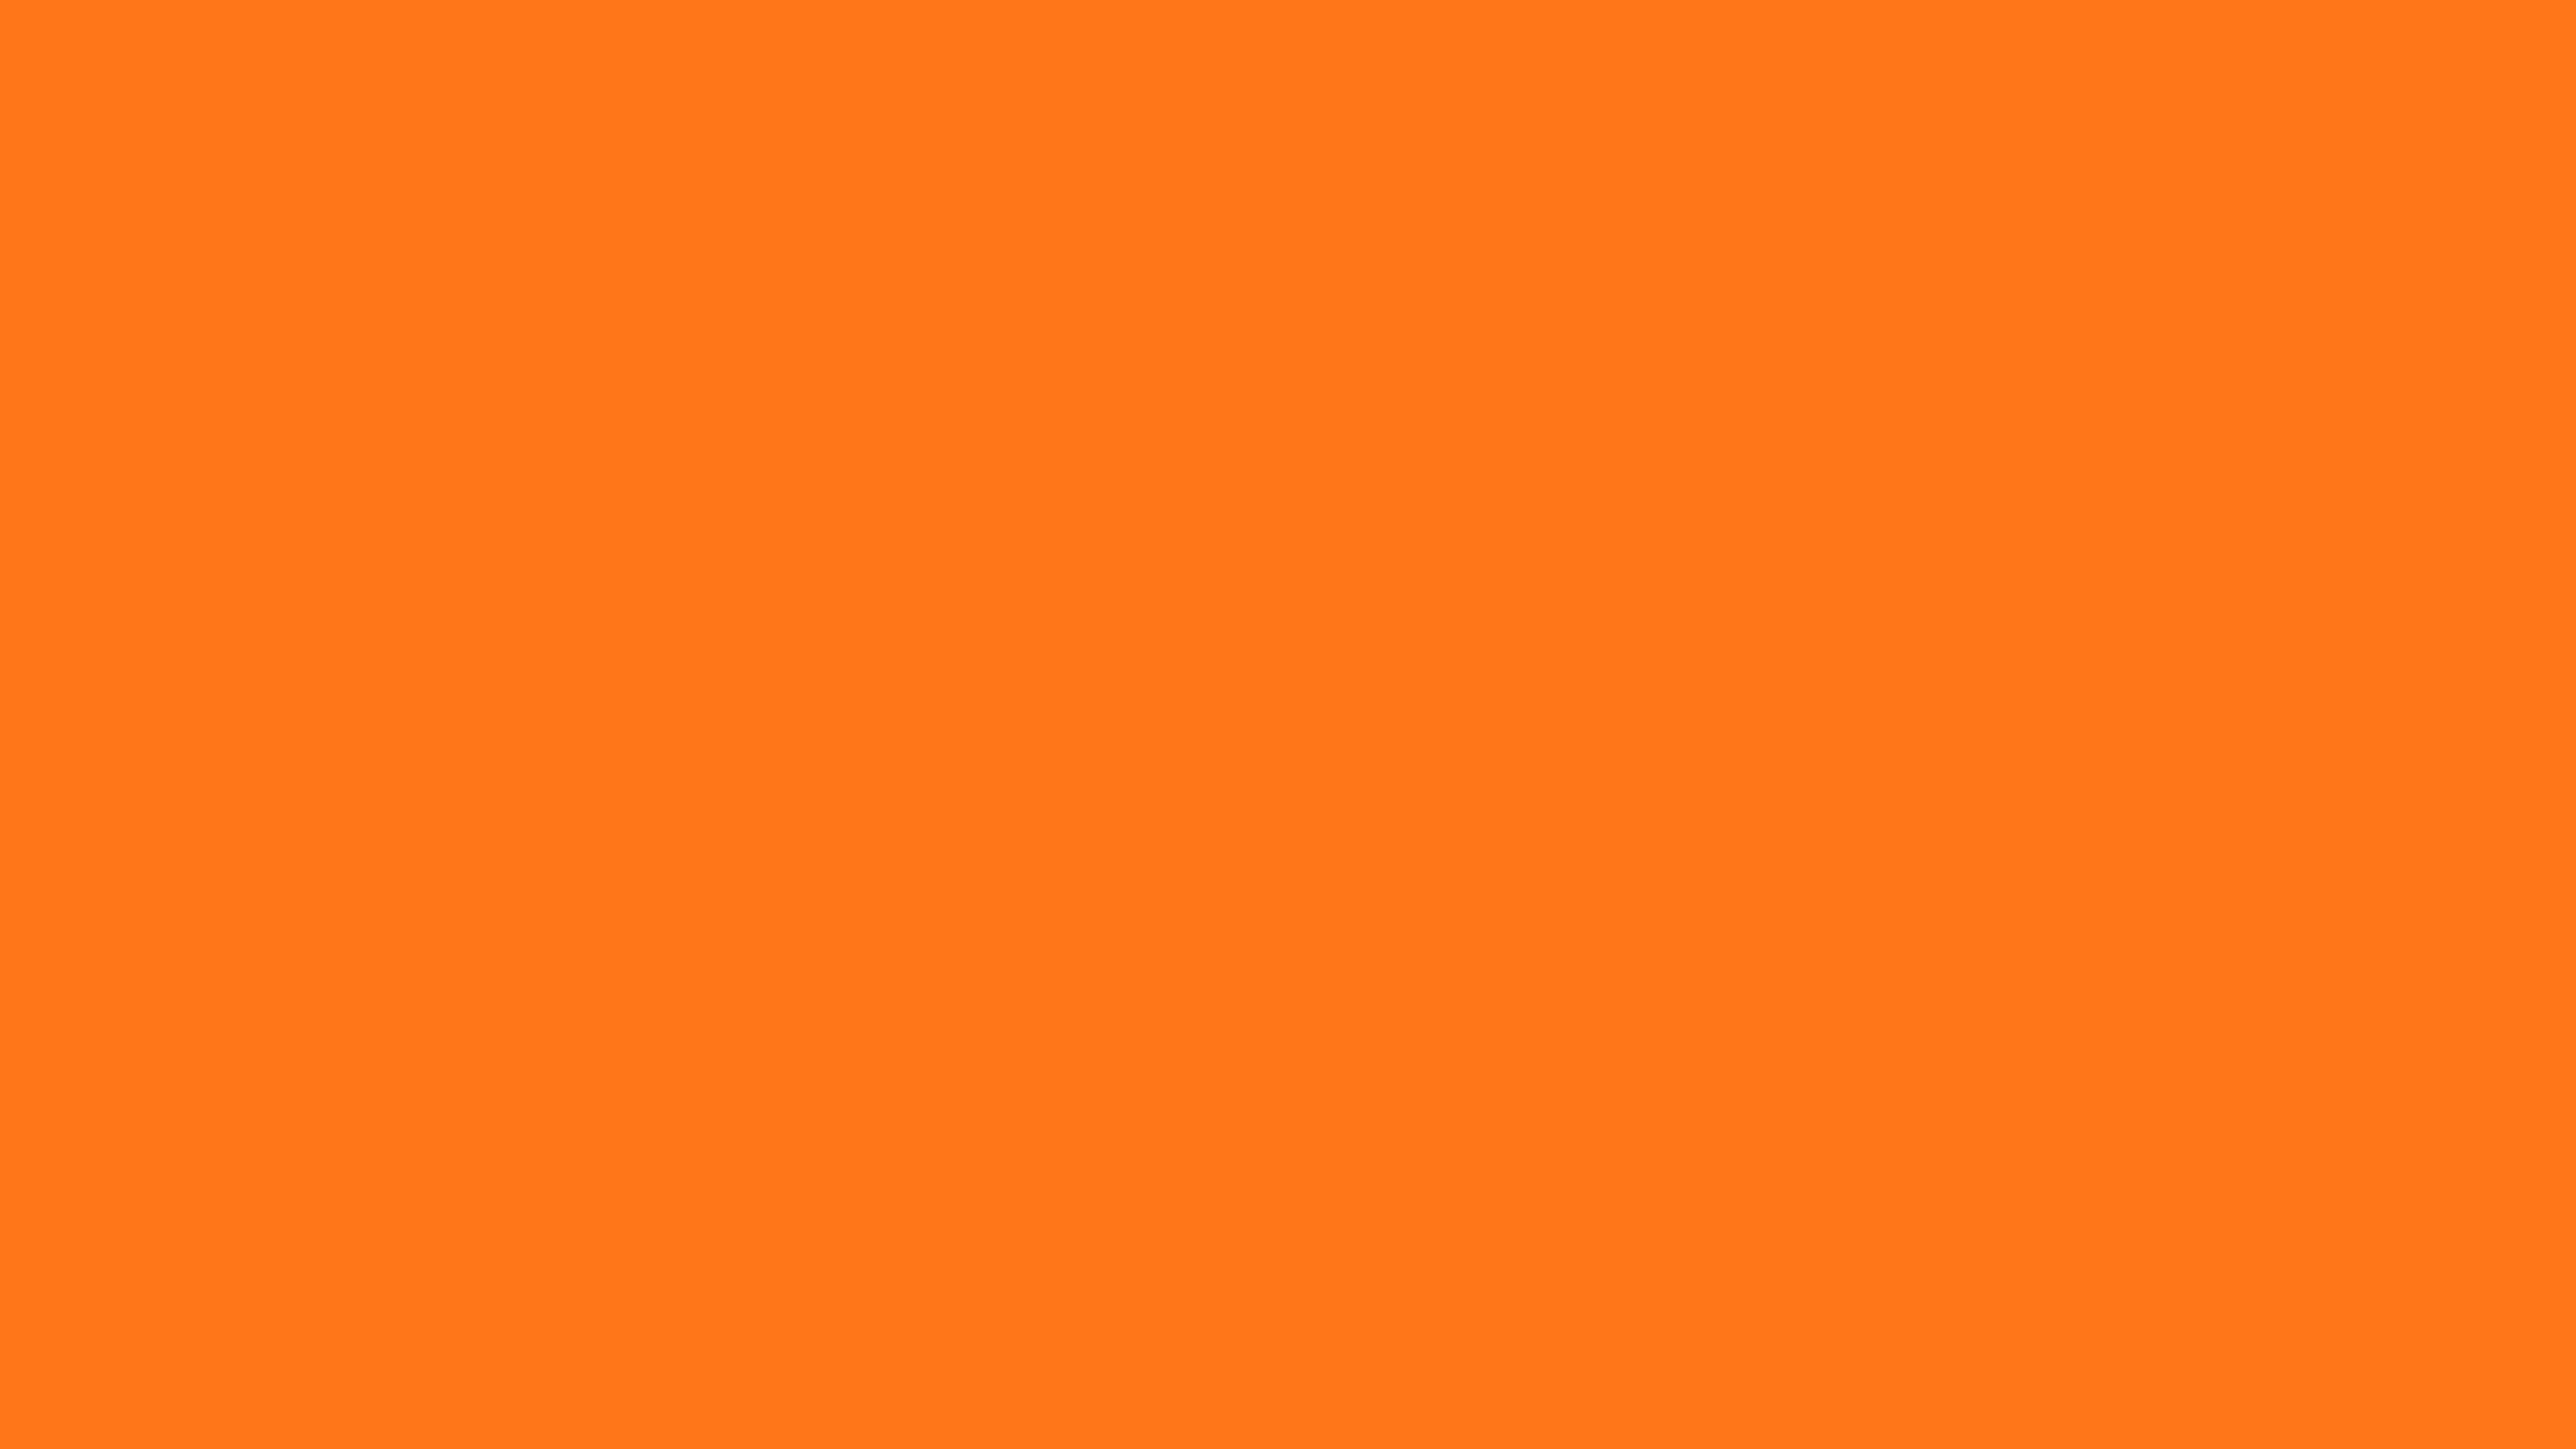 7680x4320 Pumpkin Solid Color Background